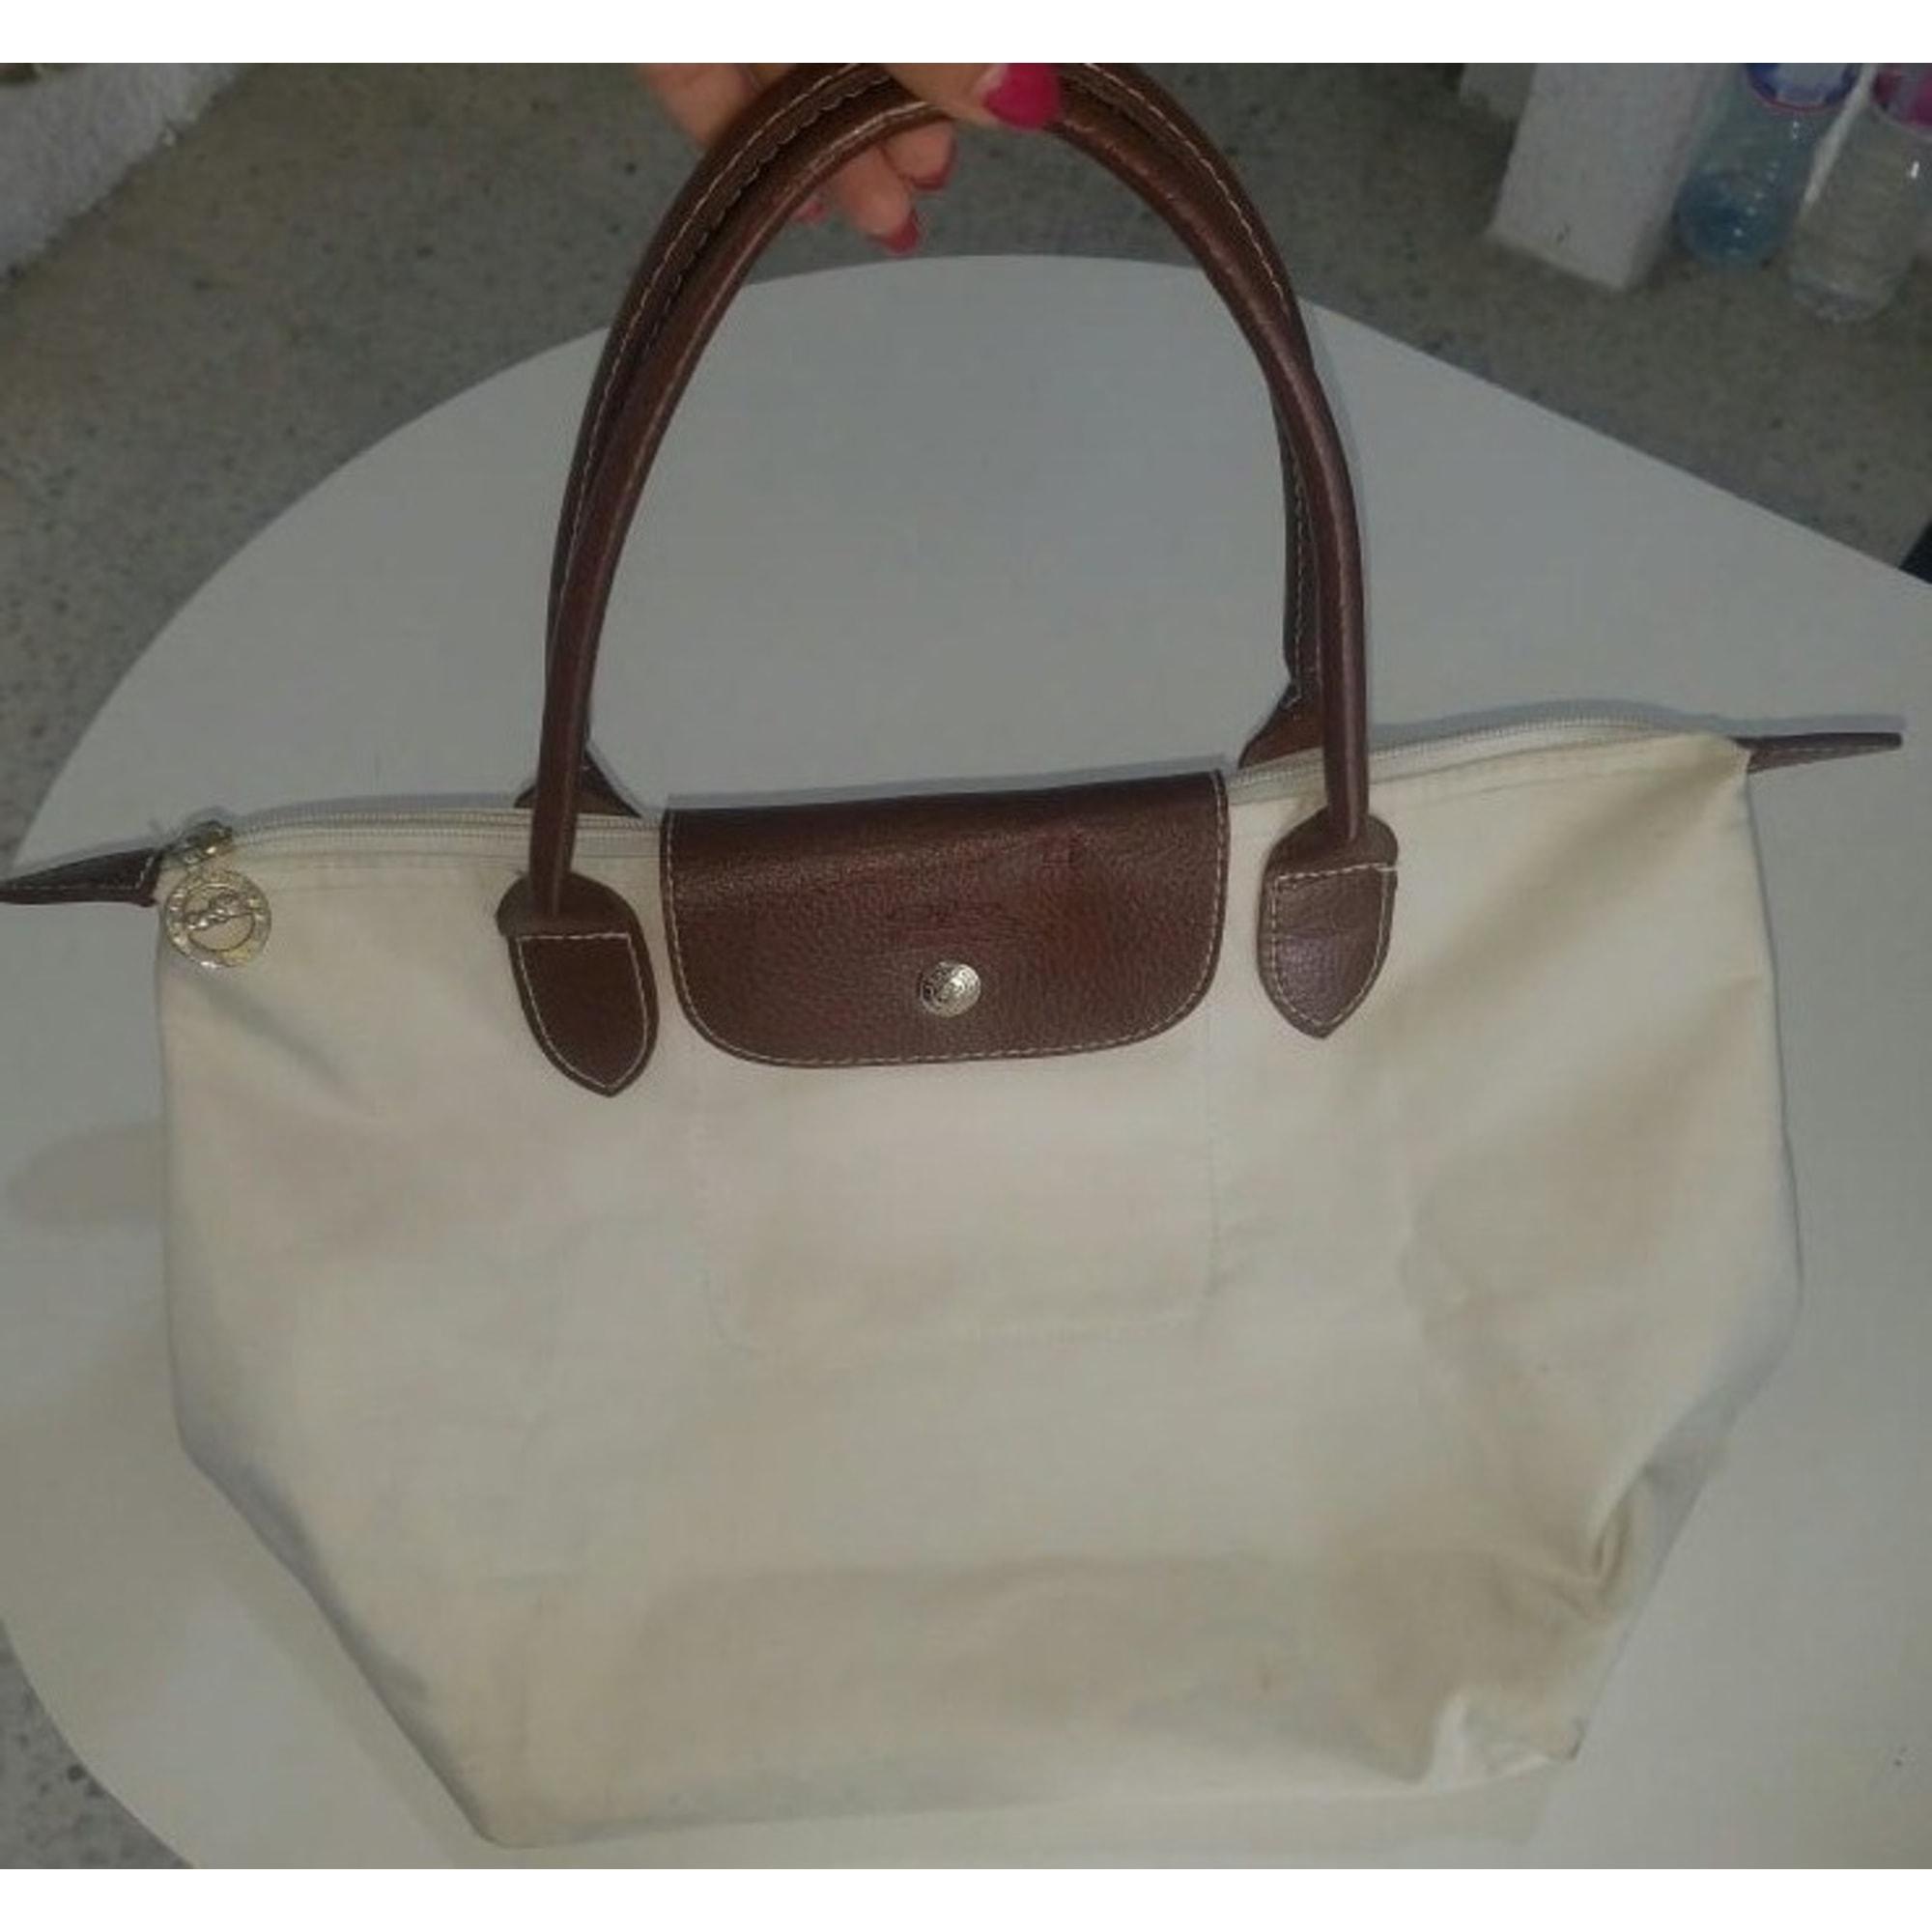 Sac à main en tissu LONGCHAMP Mademoiselle Longchamp Blanc, blanc cassé, écru